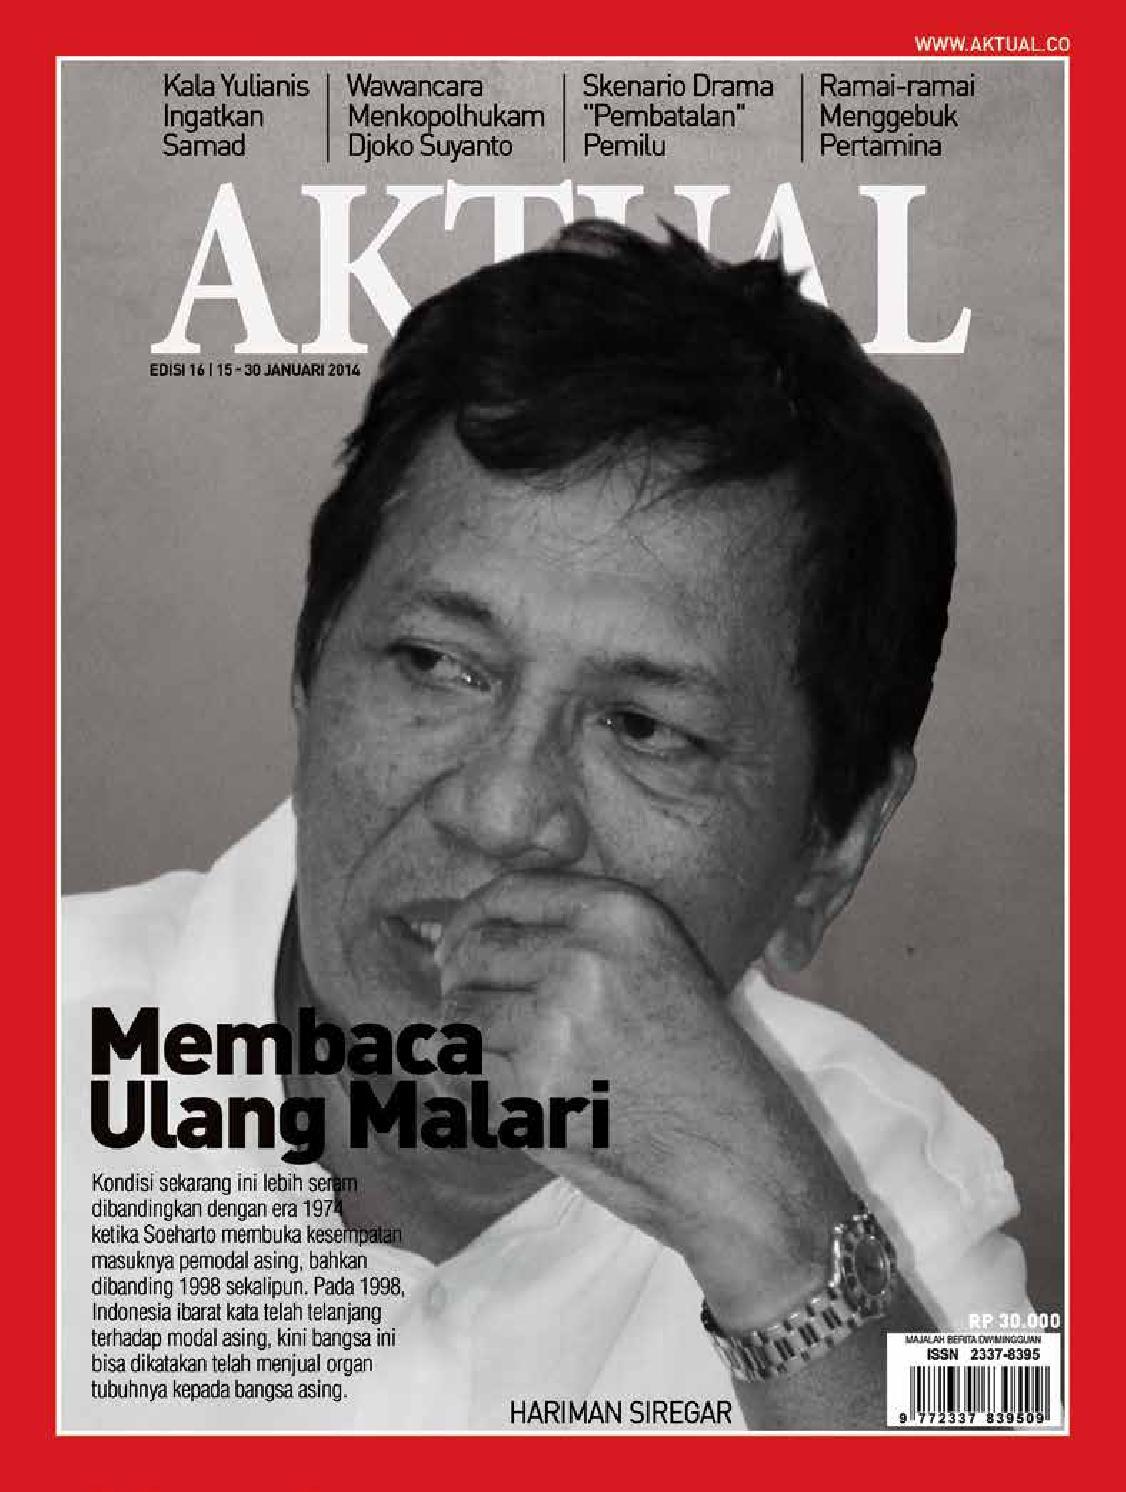 Aktual edisi 16 by widhi maulana - issuu